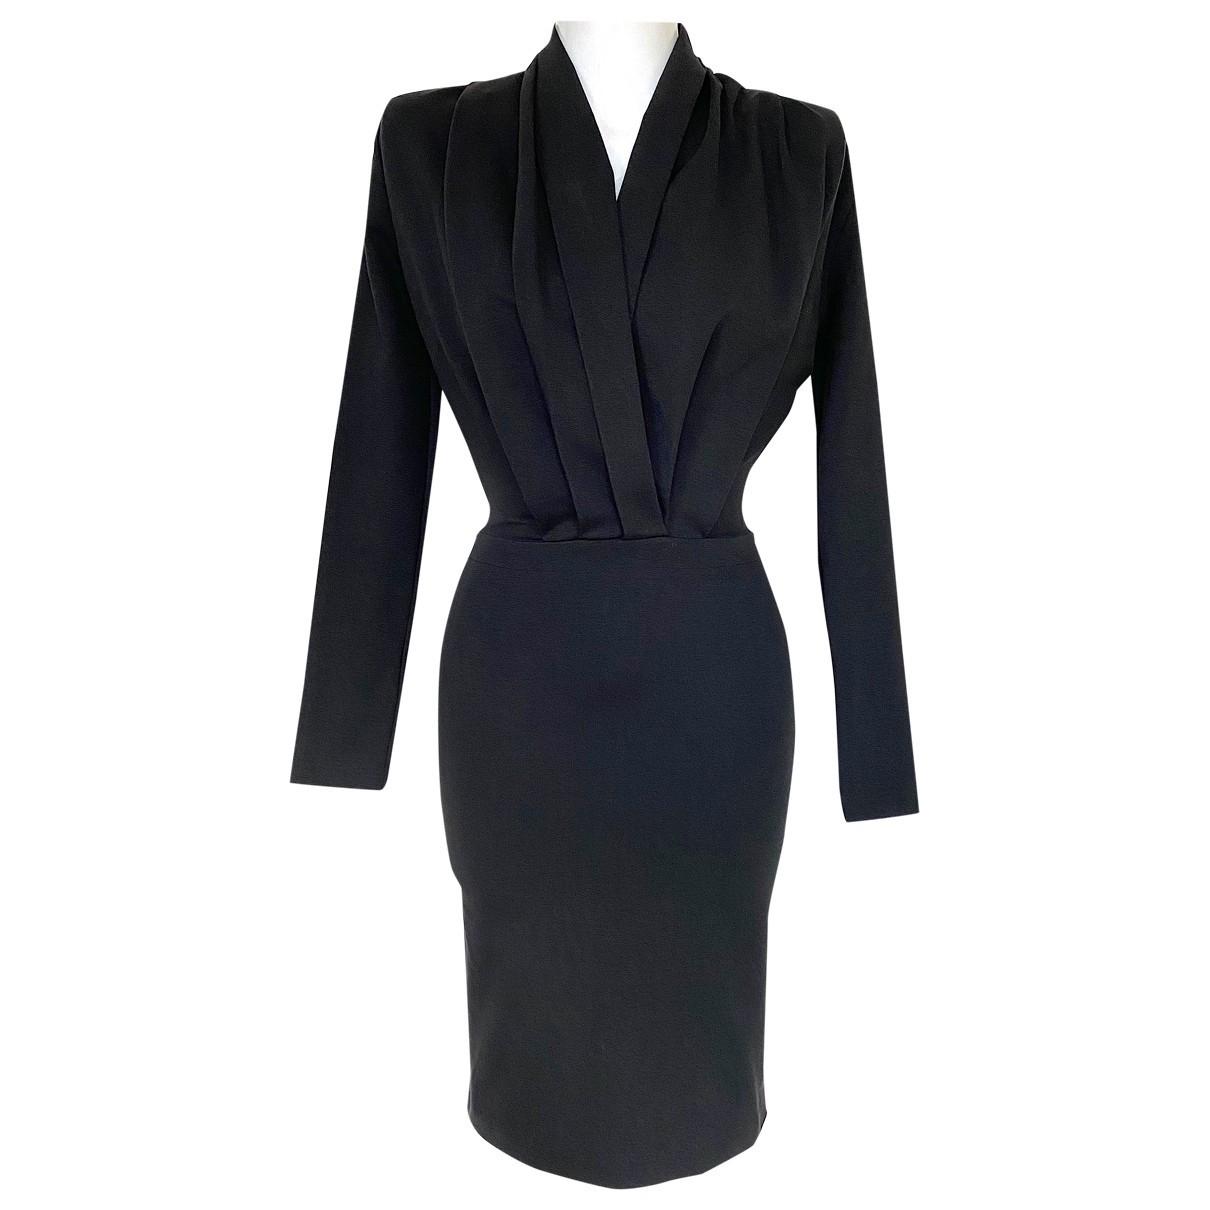 Stella Mccartney \N Black Cotton dress for Women 40 IT